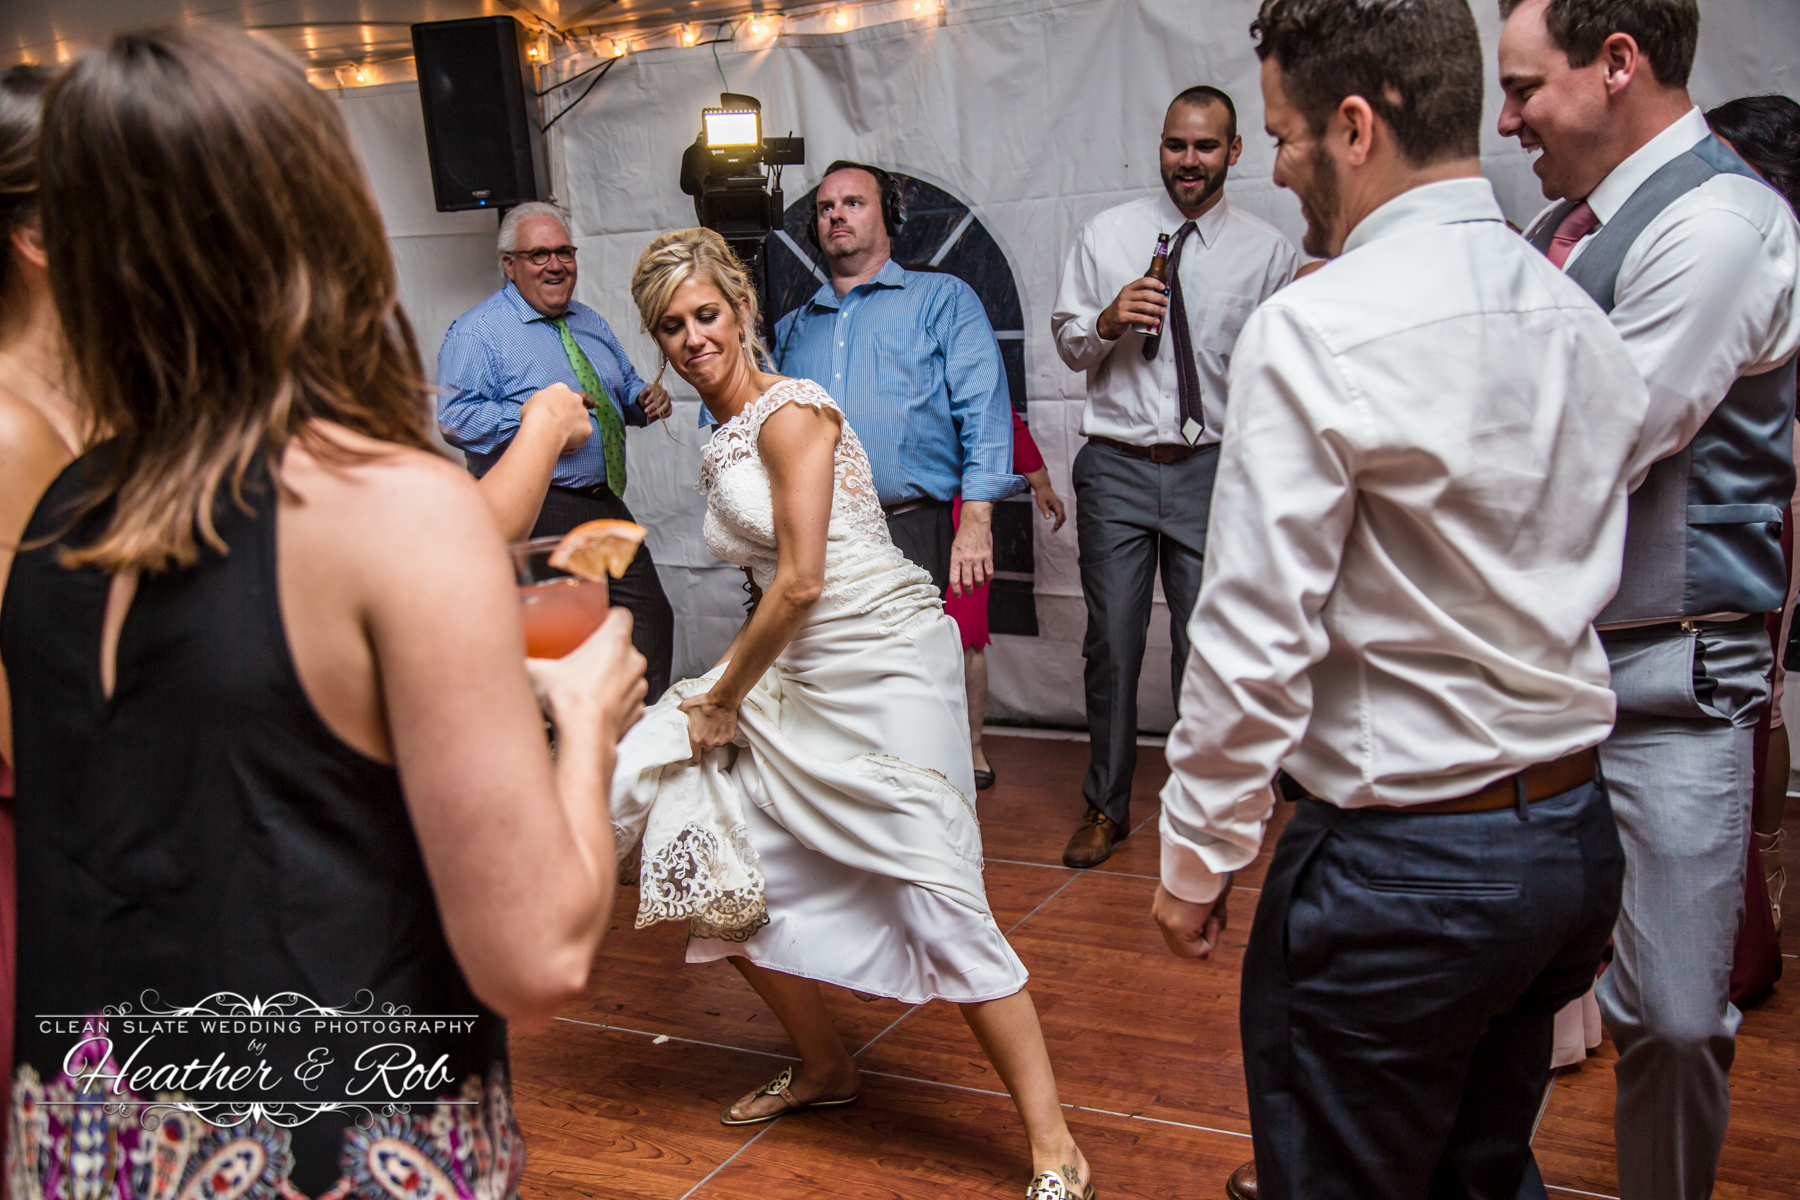 bride lifting up dress to dance at wedding